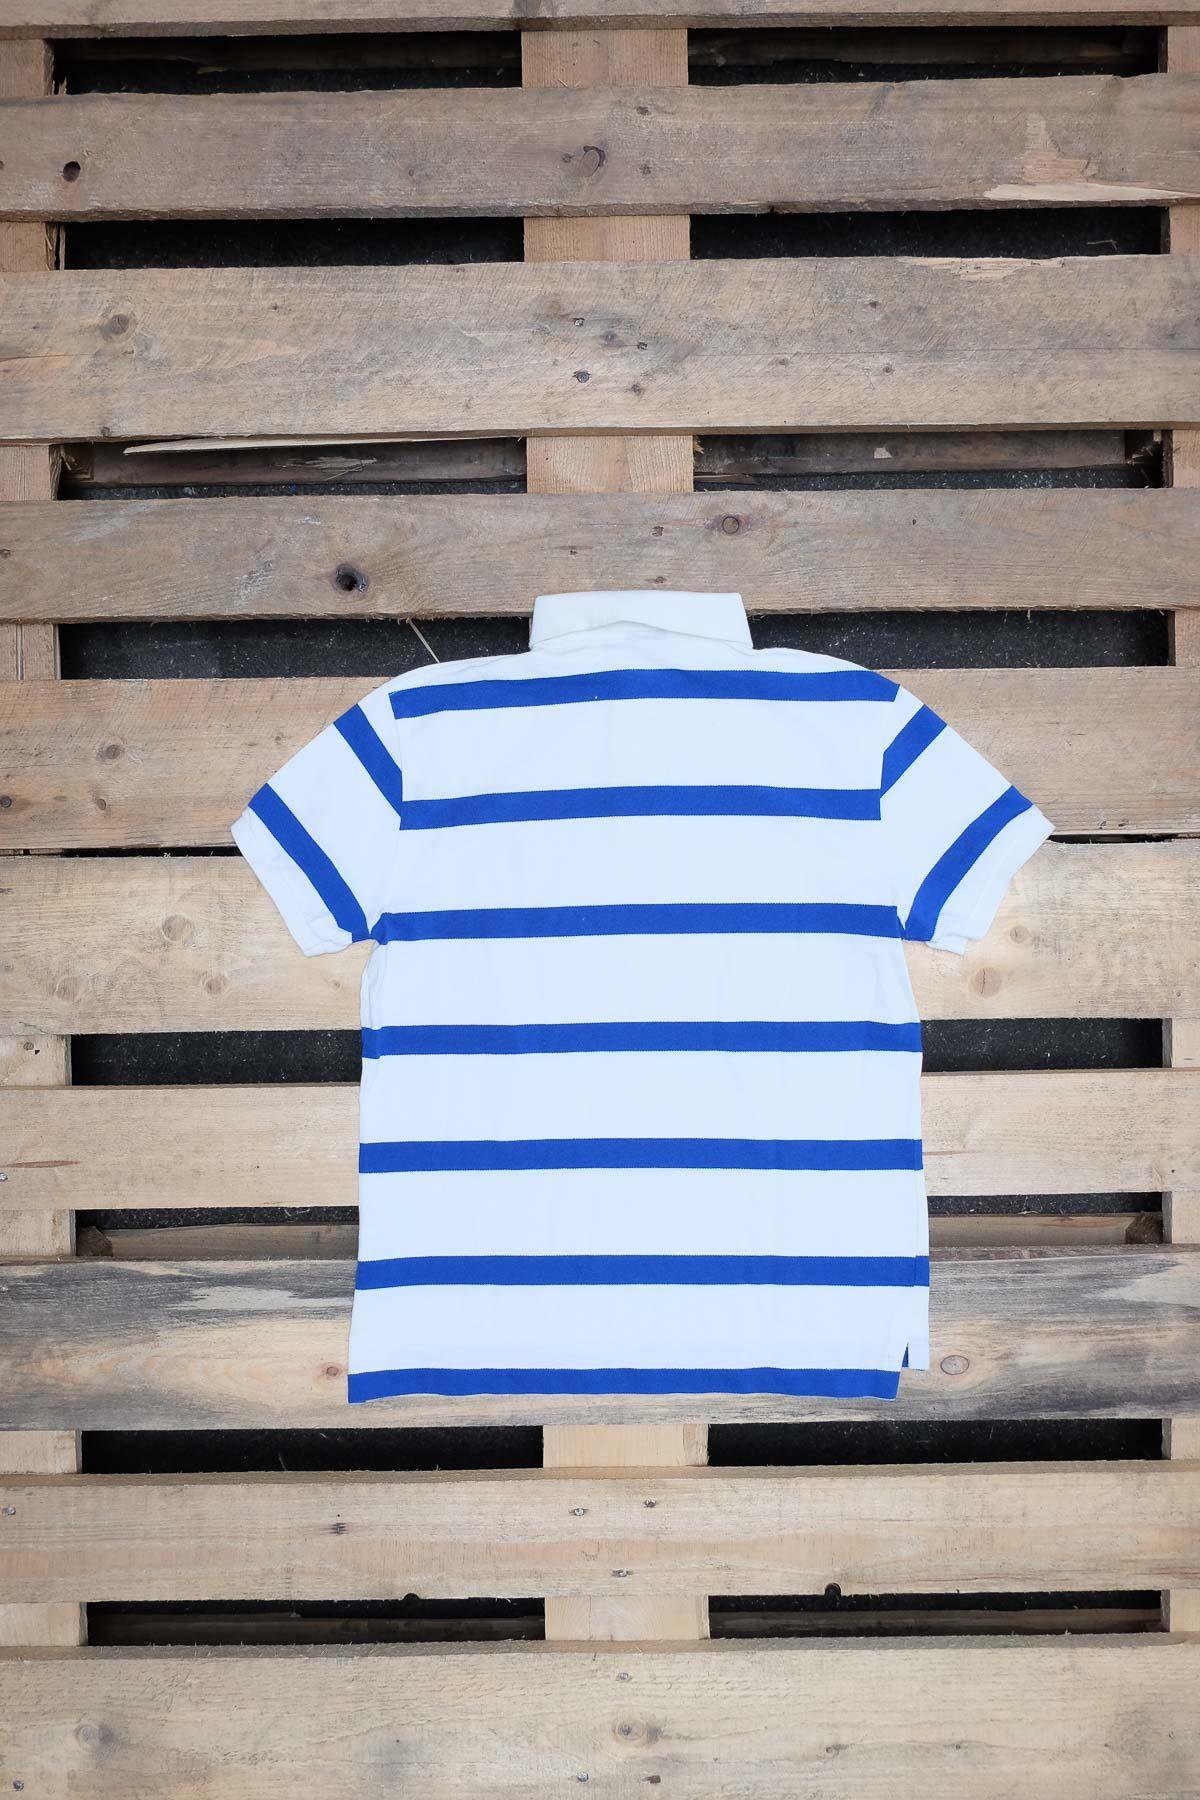 Ralph Lauren T-SHIRT POLO VINTAGE White-Blue